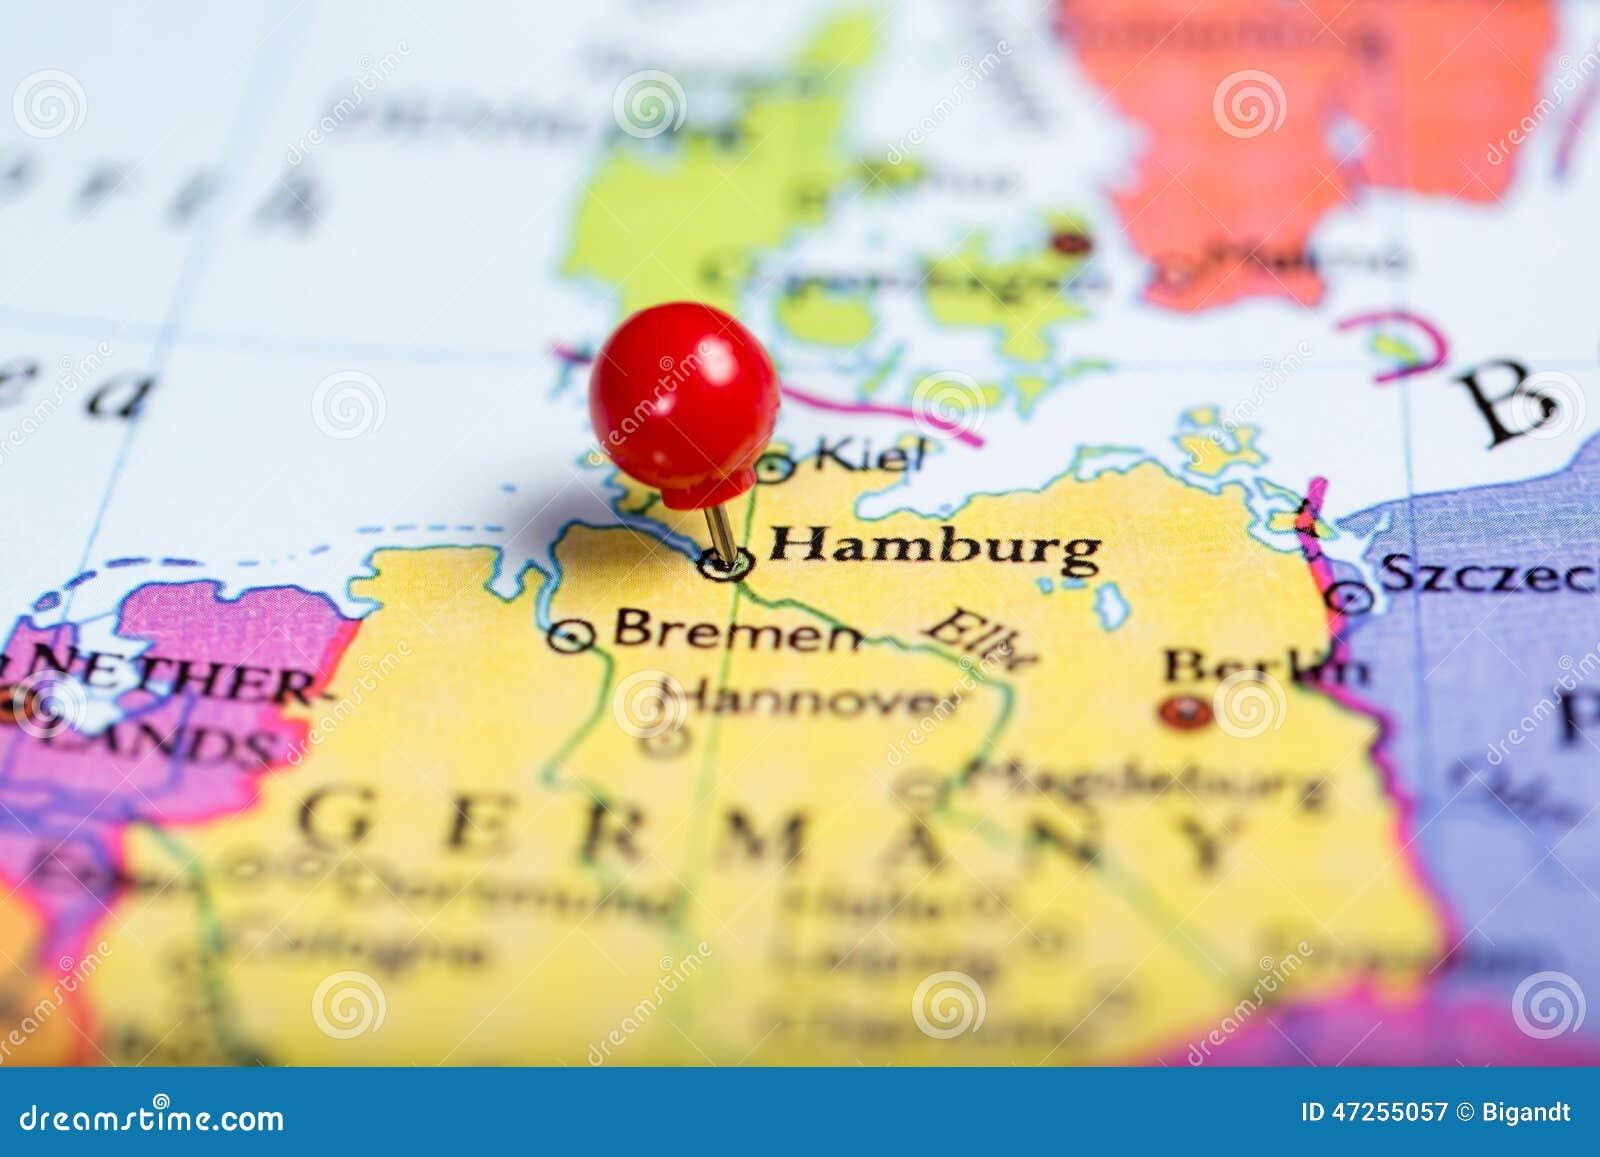 Map Of Germany Hamburg.Red Push Pin On Map Of Germany Stock Image Image Of Hamburg